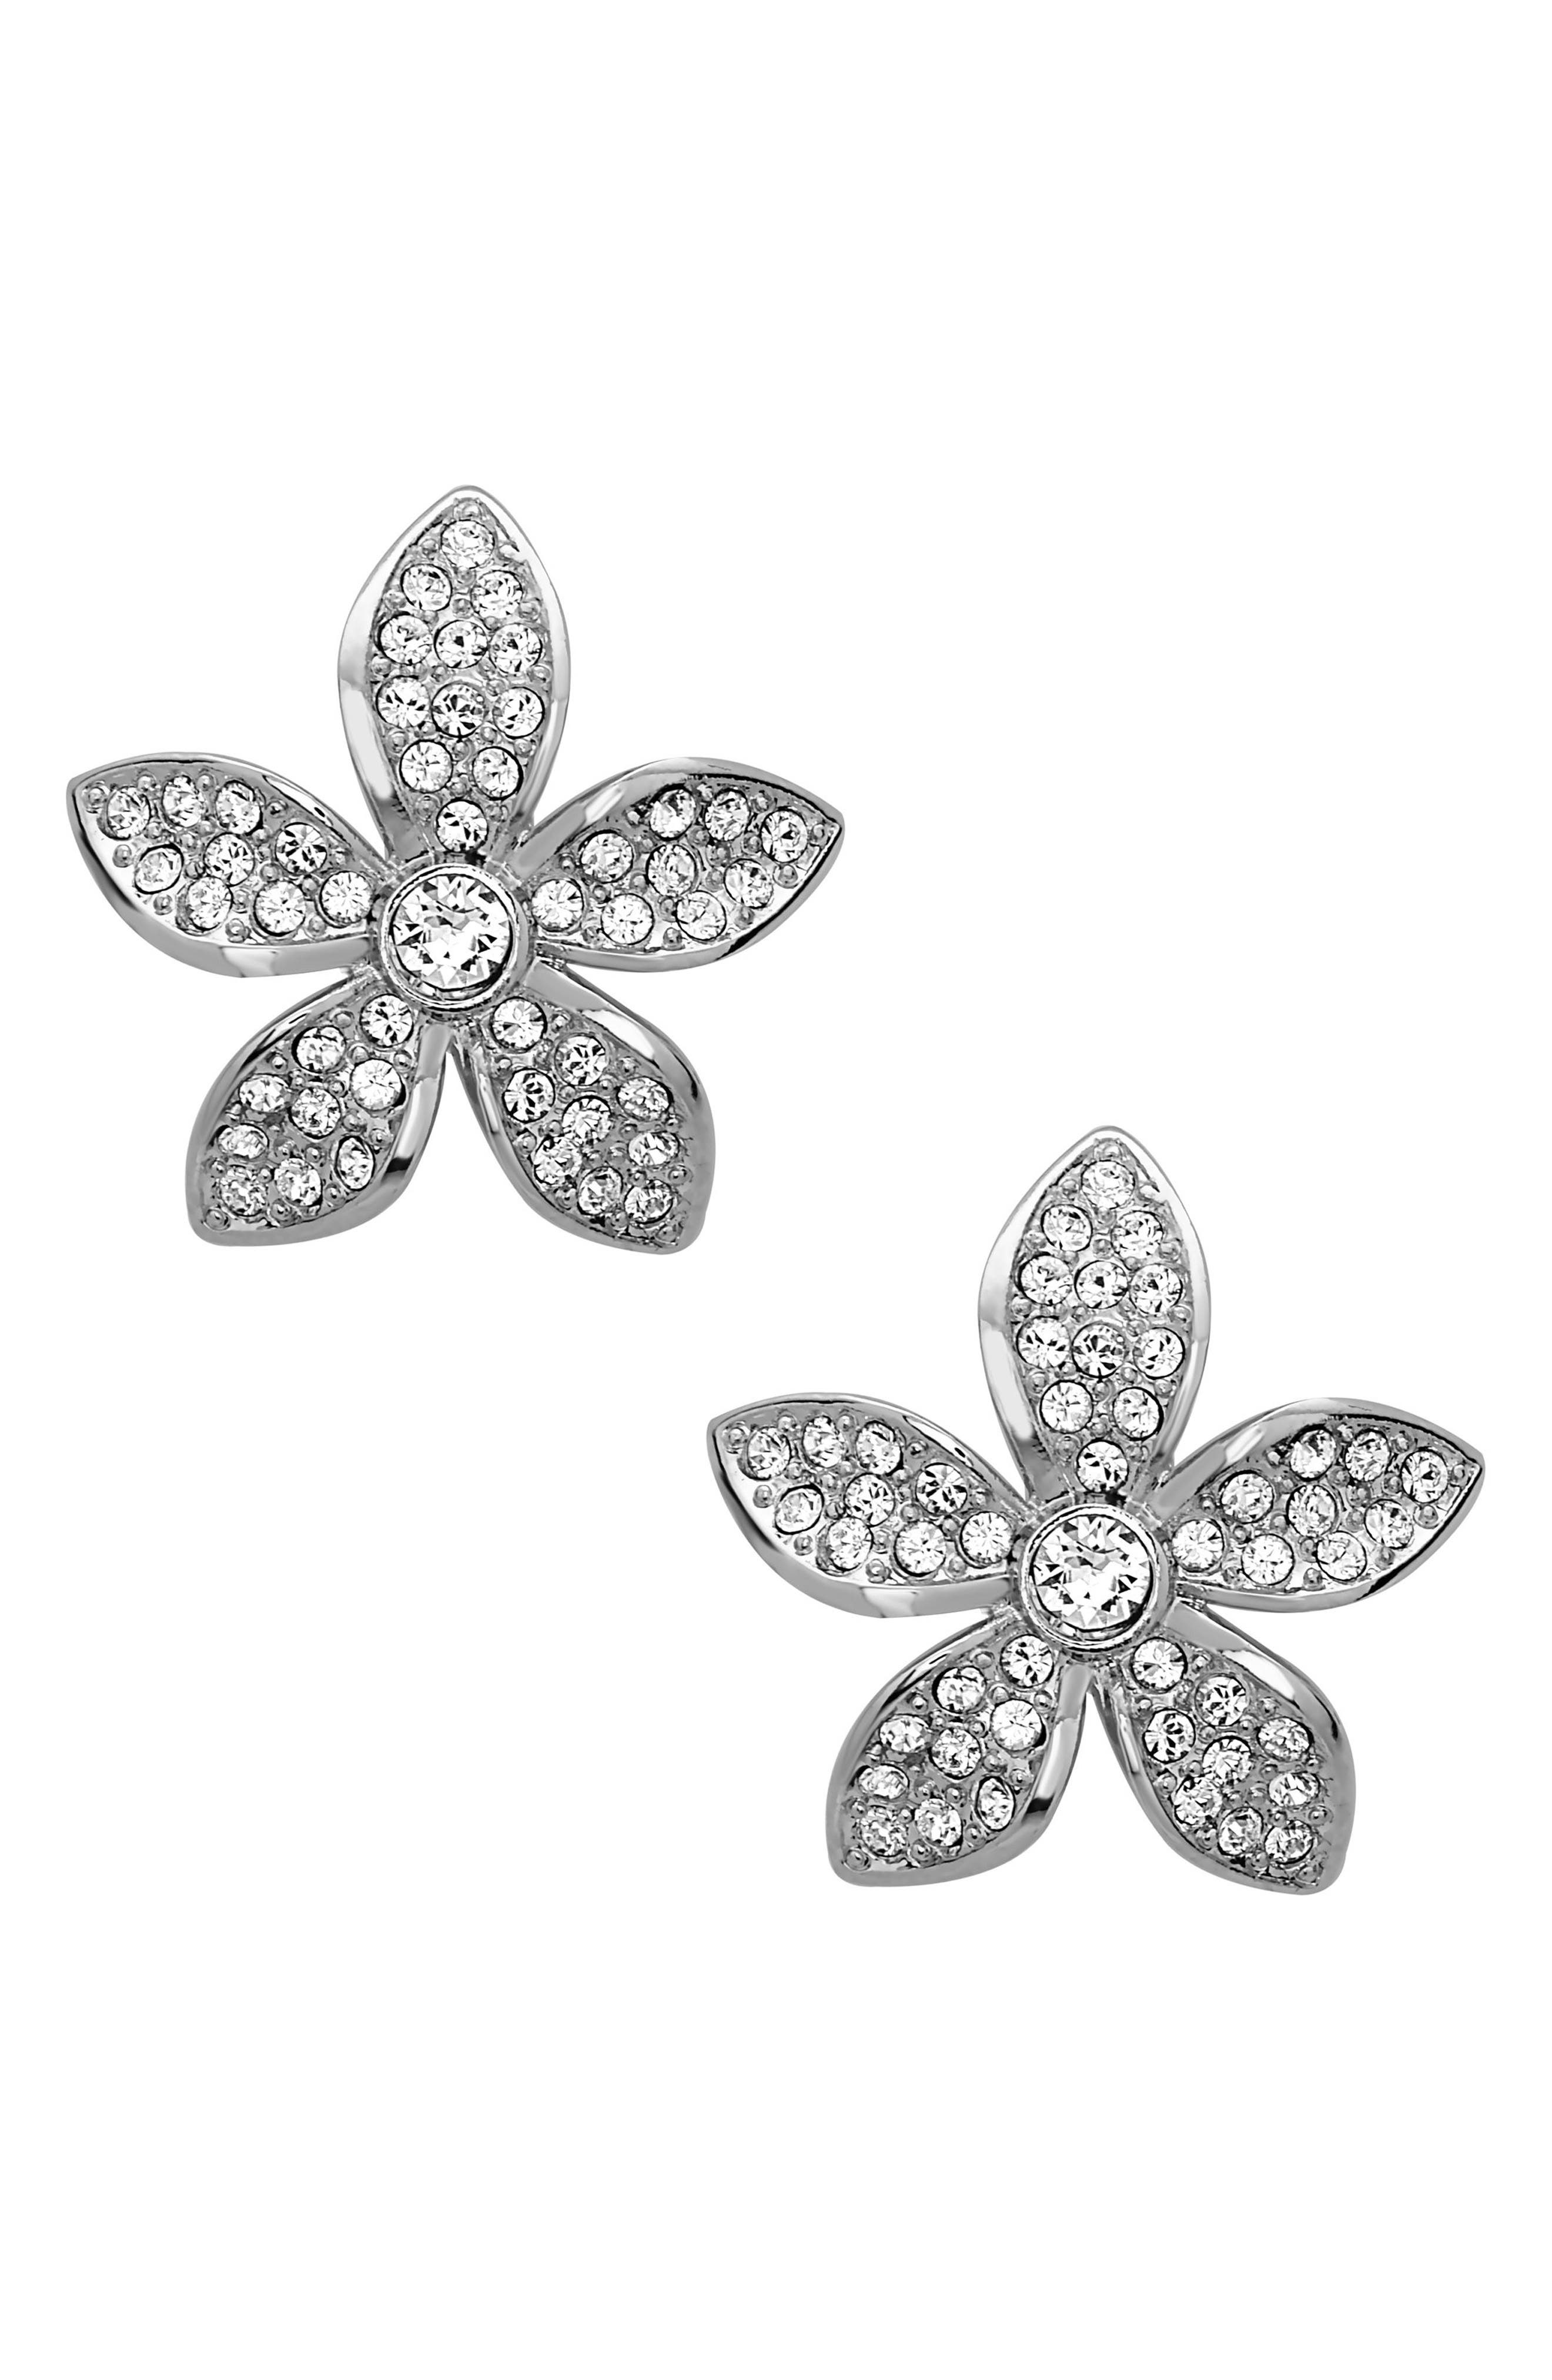 Floral Crystal Stud Earrings,                         Main,                         color, Silver